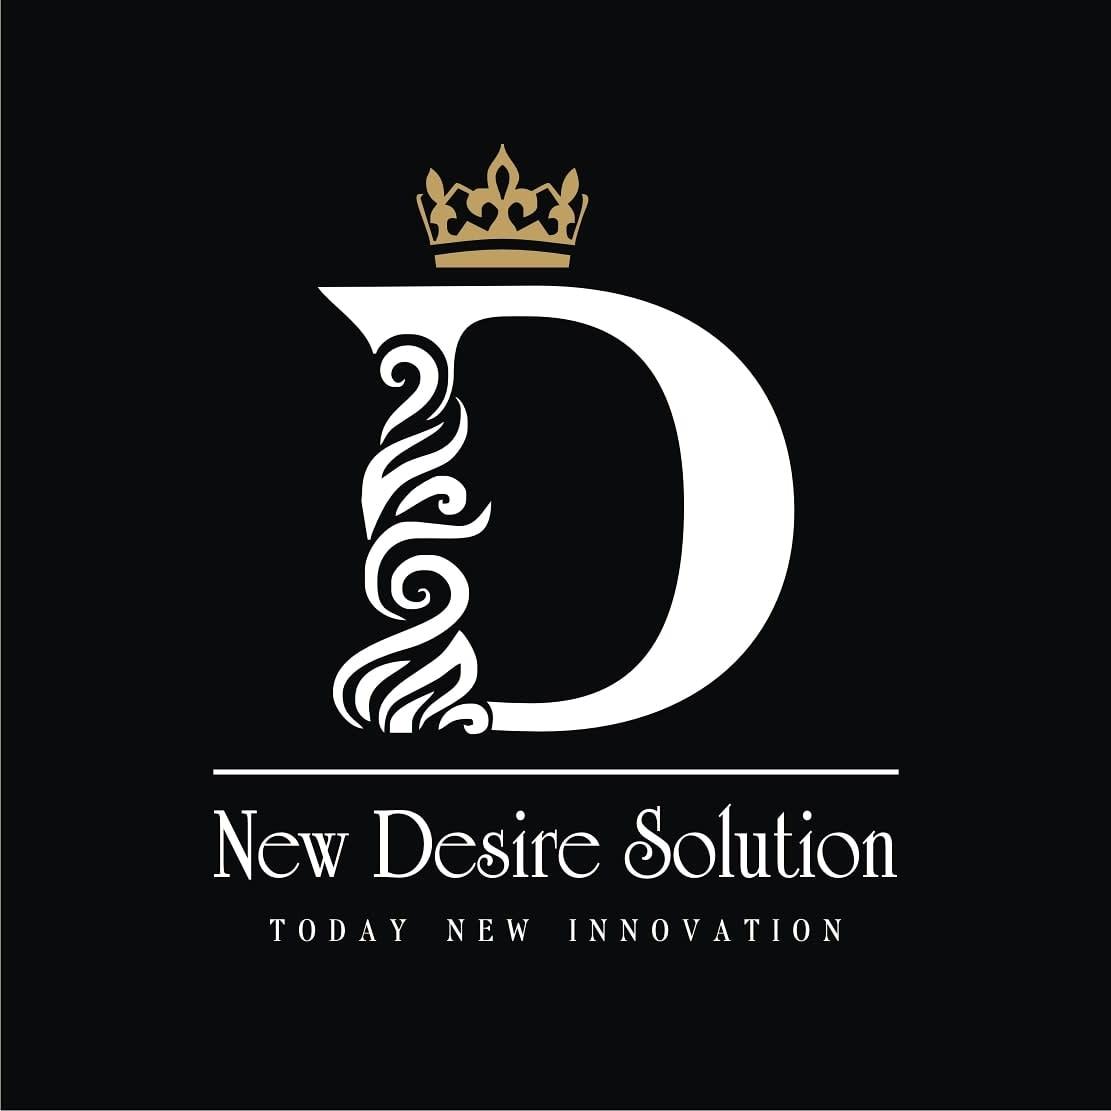 New Desire Solution